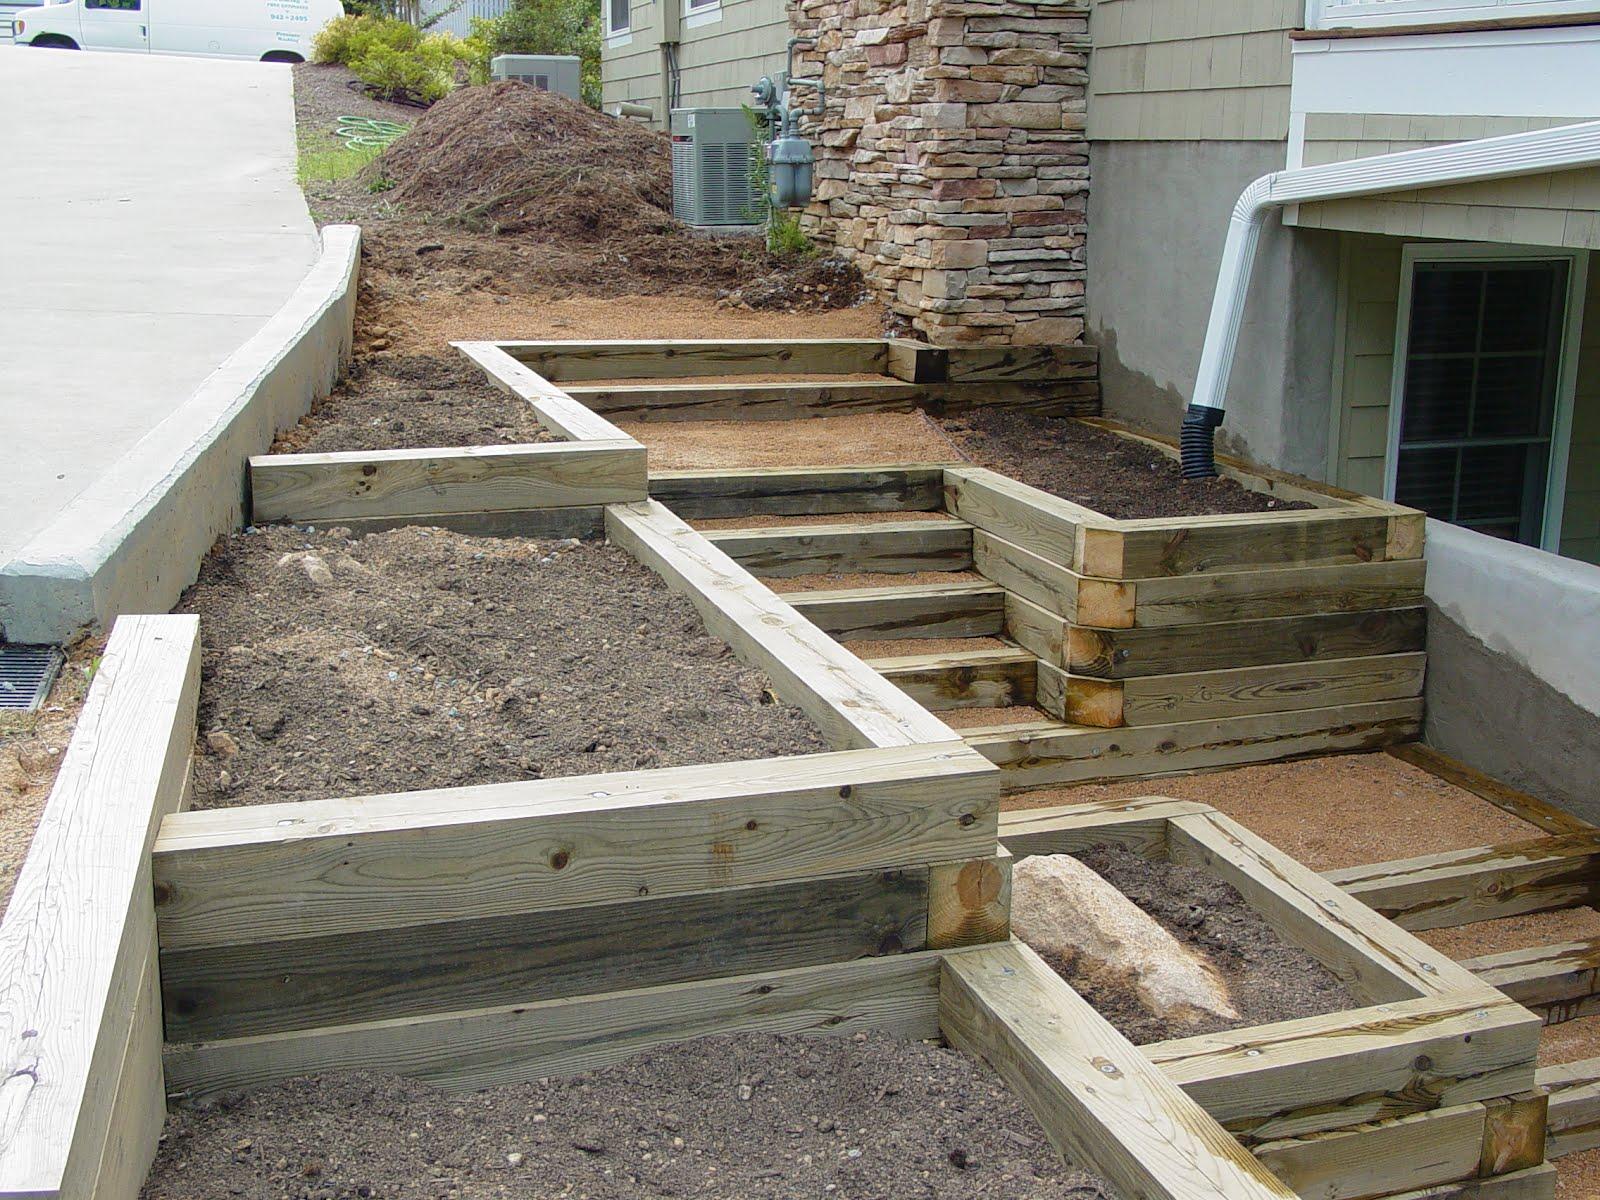 Home Design Studio Chapel Hill Nc Dirt Floor Roof Sky Robbs Southern Village